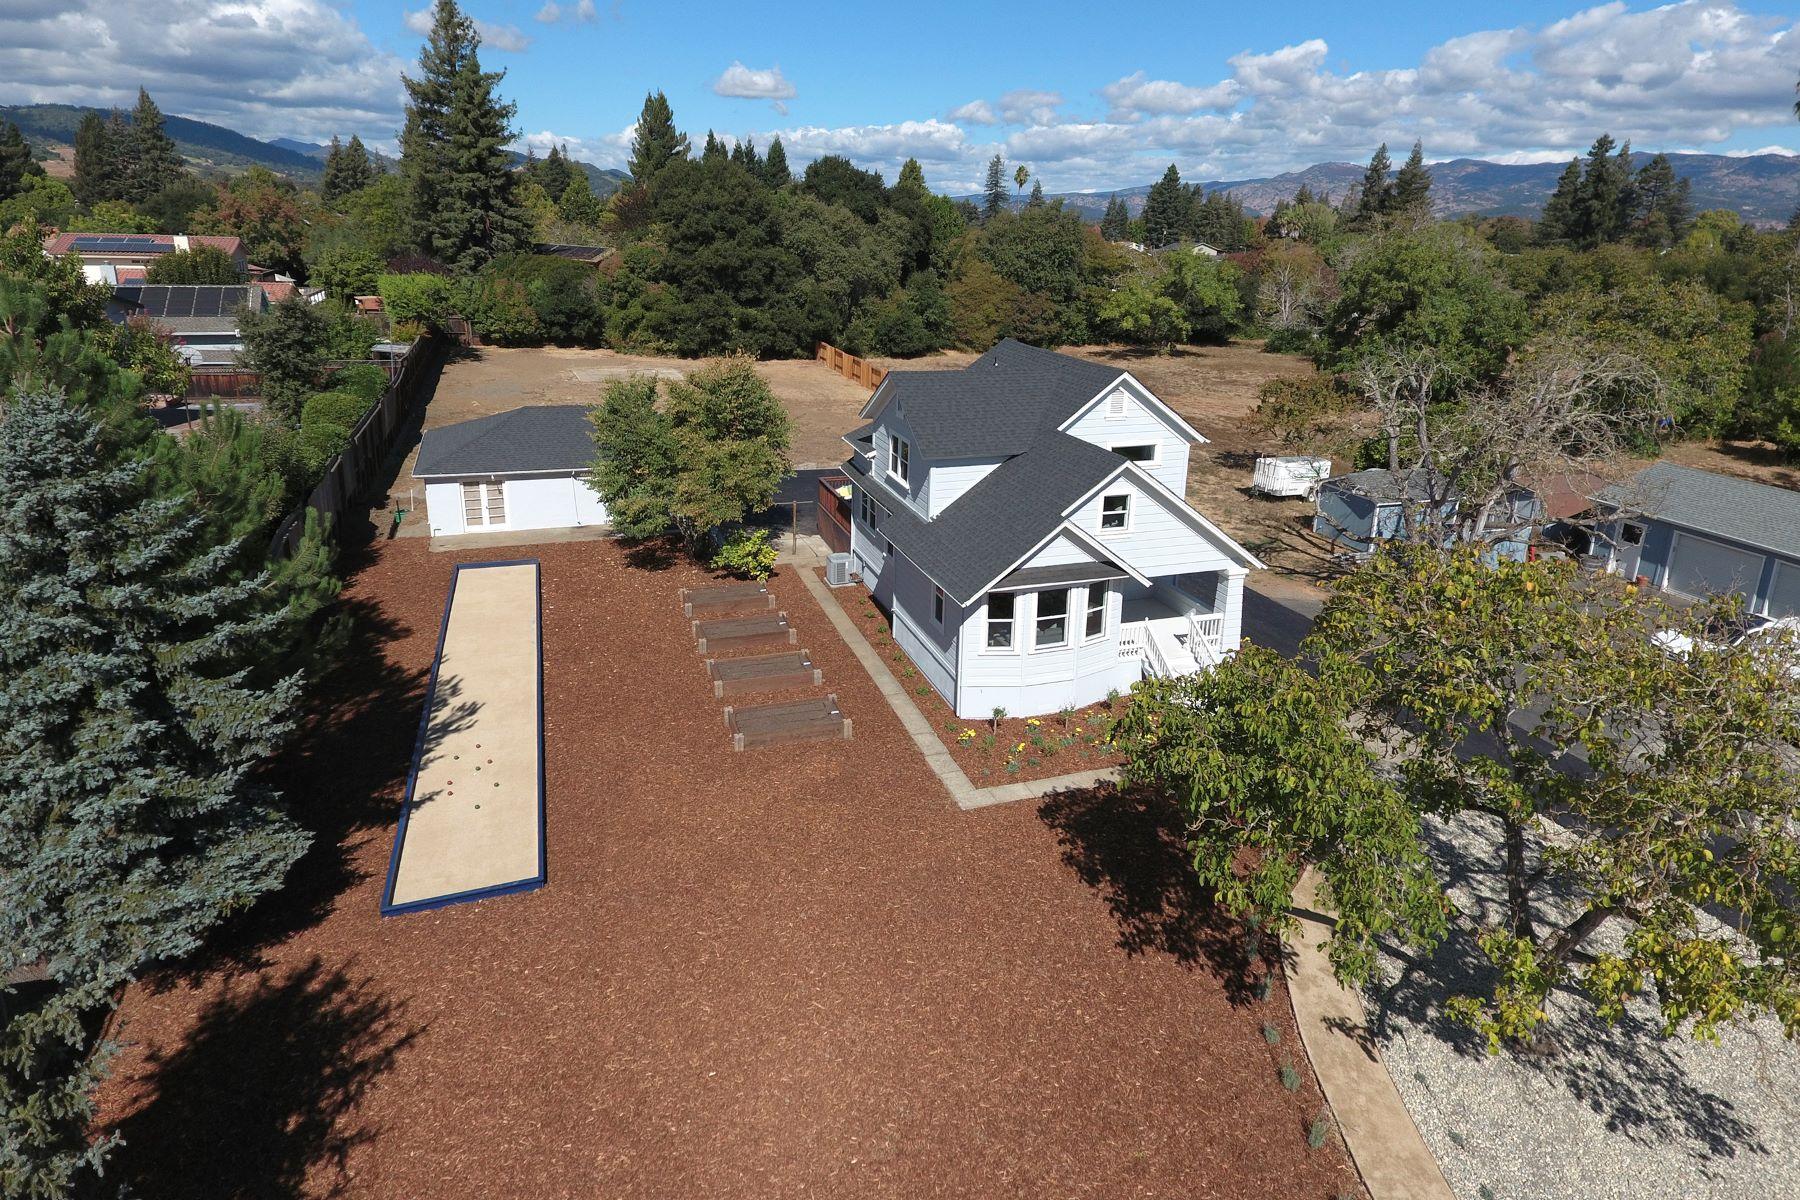 Casa Unifamiliar por un Venta en A Savvy Country Retreat on an Exquisite Lot 2588 Redwood Rd Napa, California, 94558 Estados Unidos